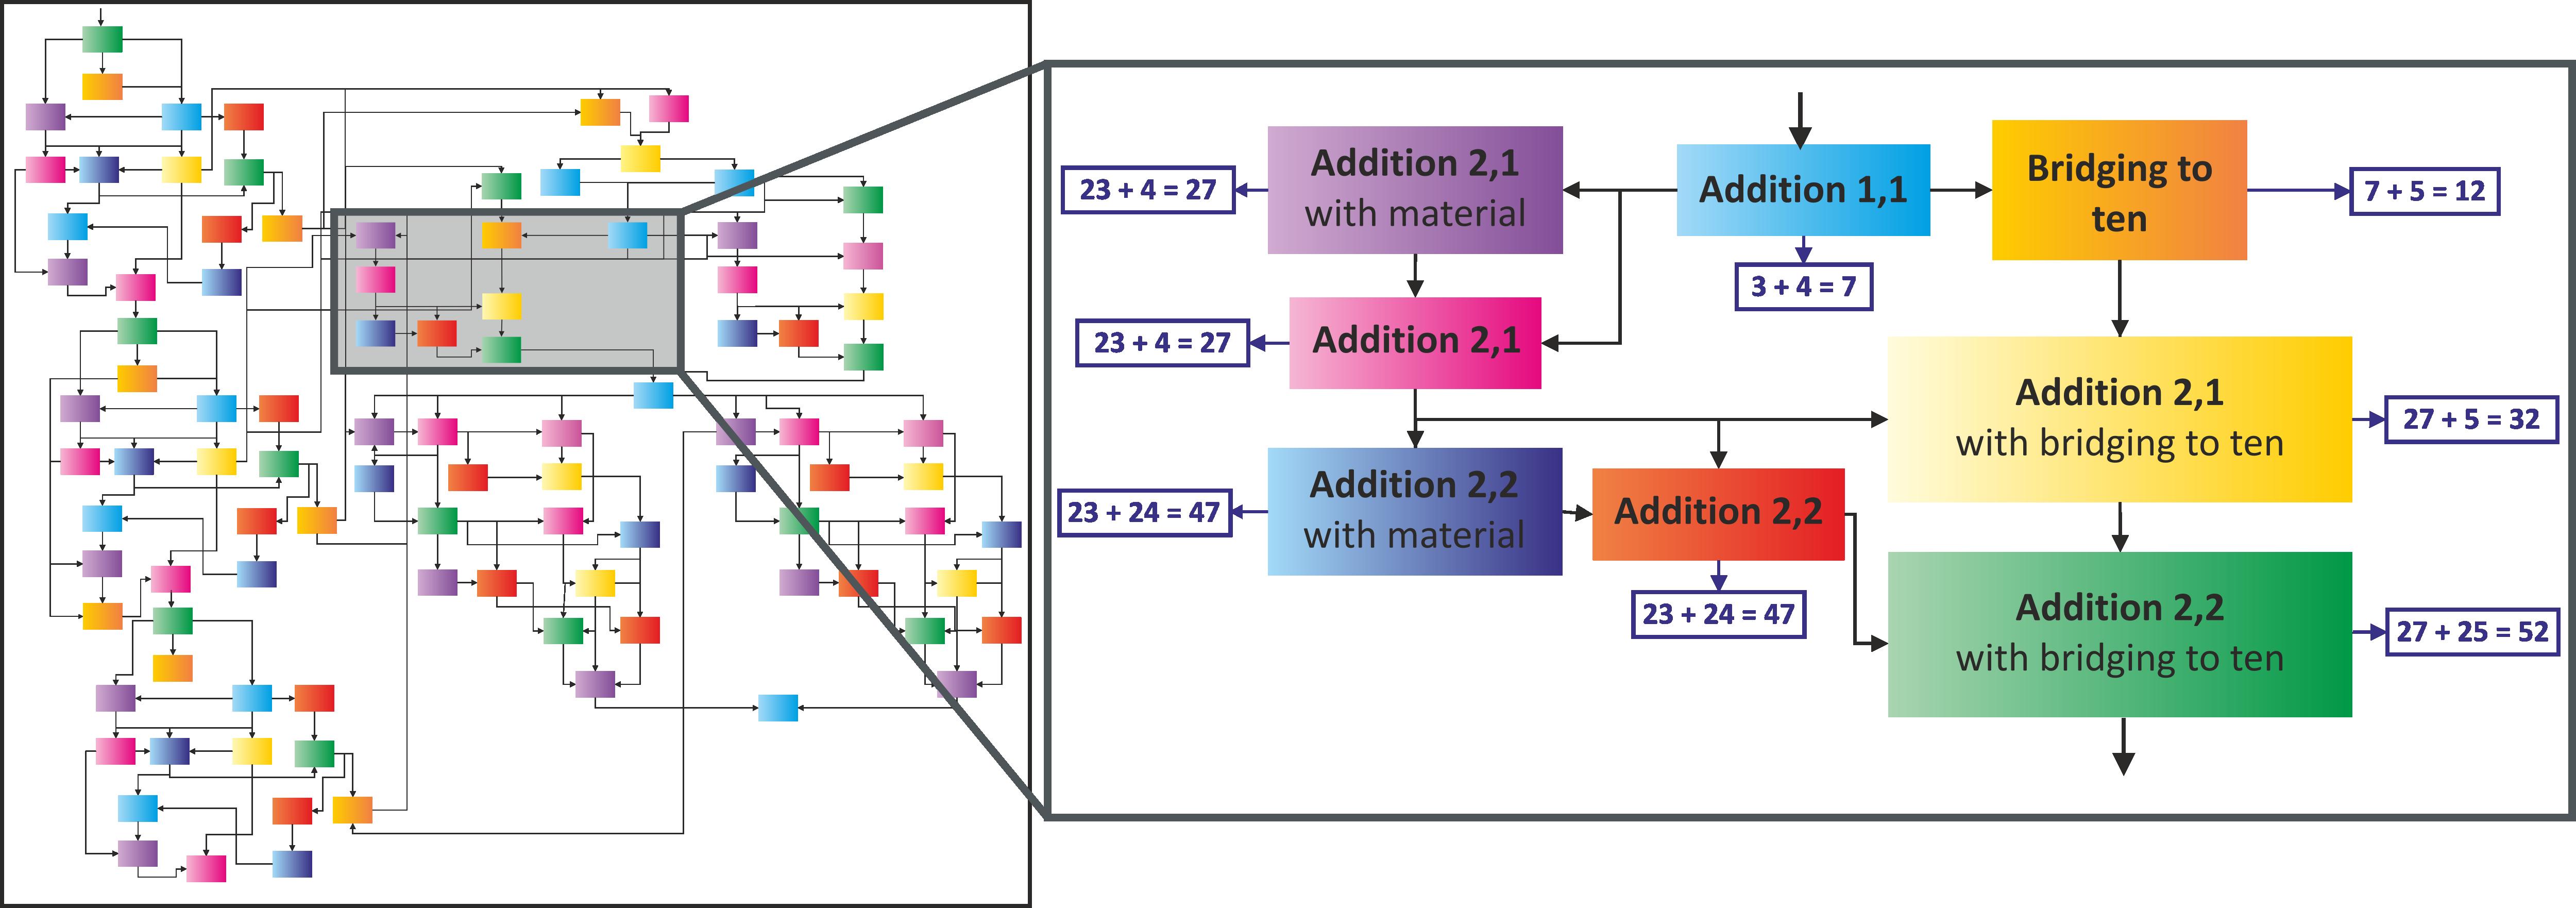 CGL @ ETHZ - Modelling and Optimizing Mathematics Learning in Children